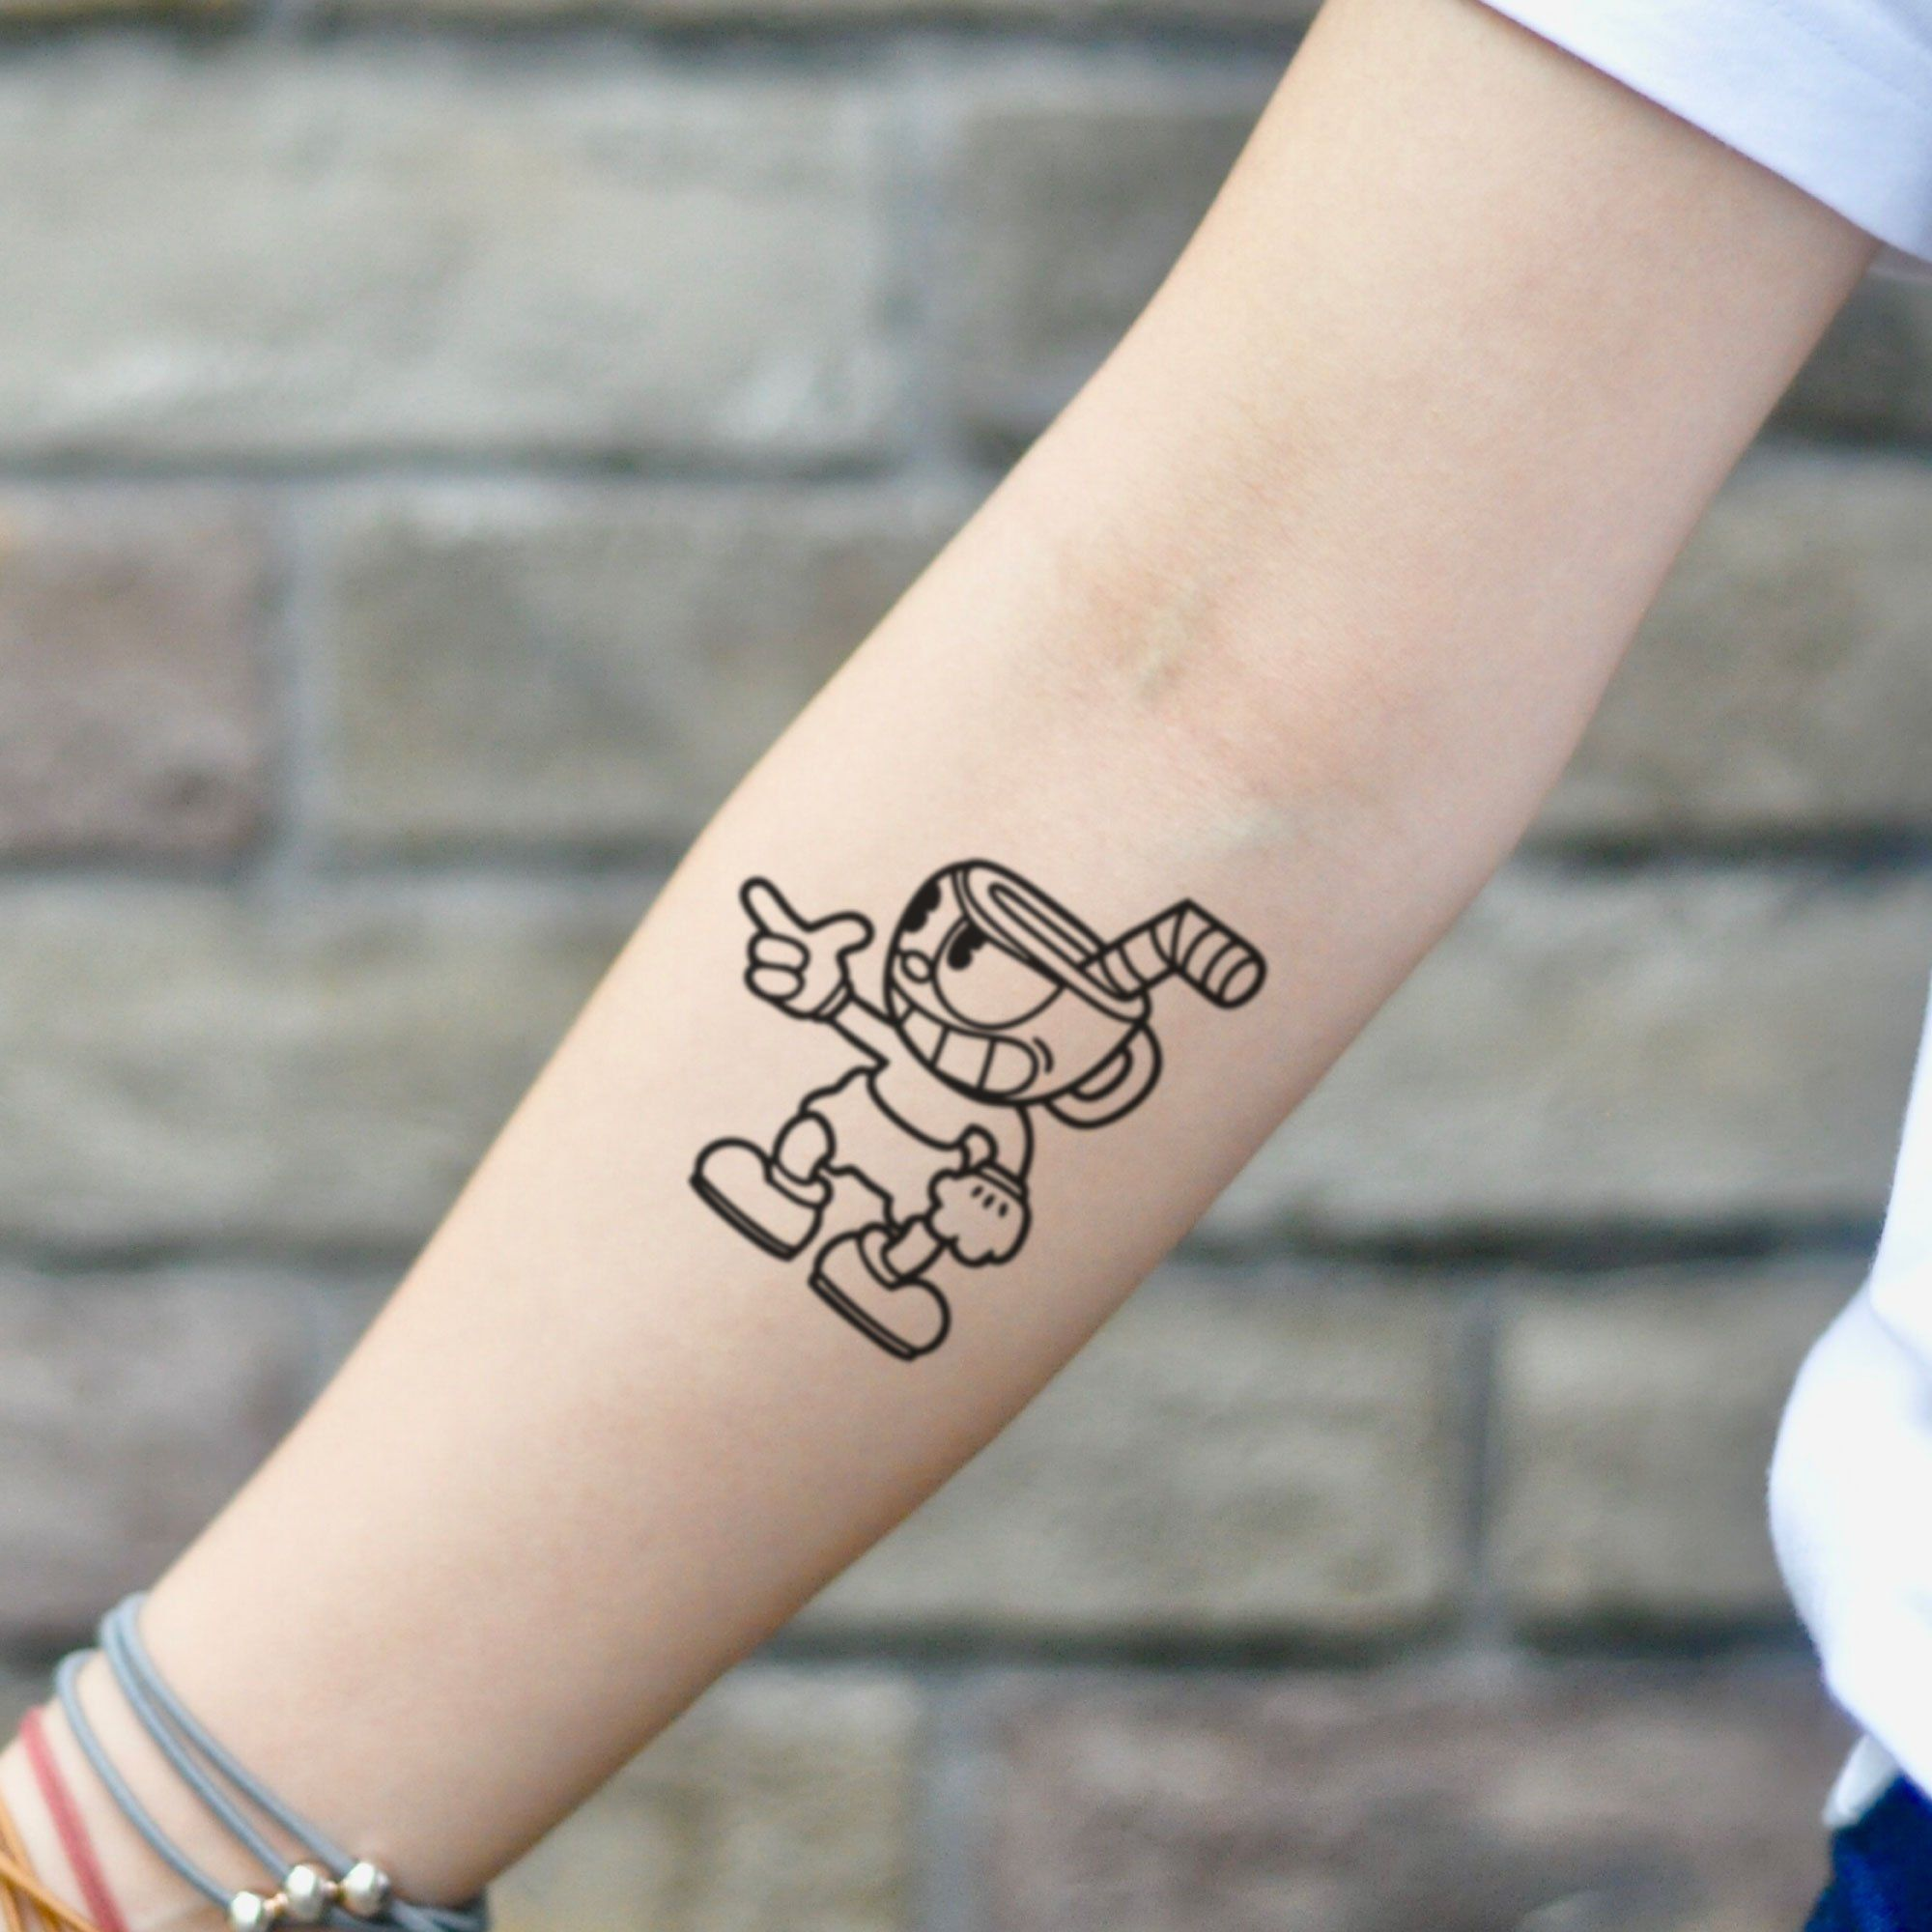 Cuphead Temporary Tattoo Sticker Set Of 2 In 2020 Mickey Mouse Tattoos Mickey Tattoo Tattoos